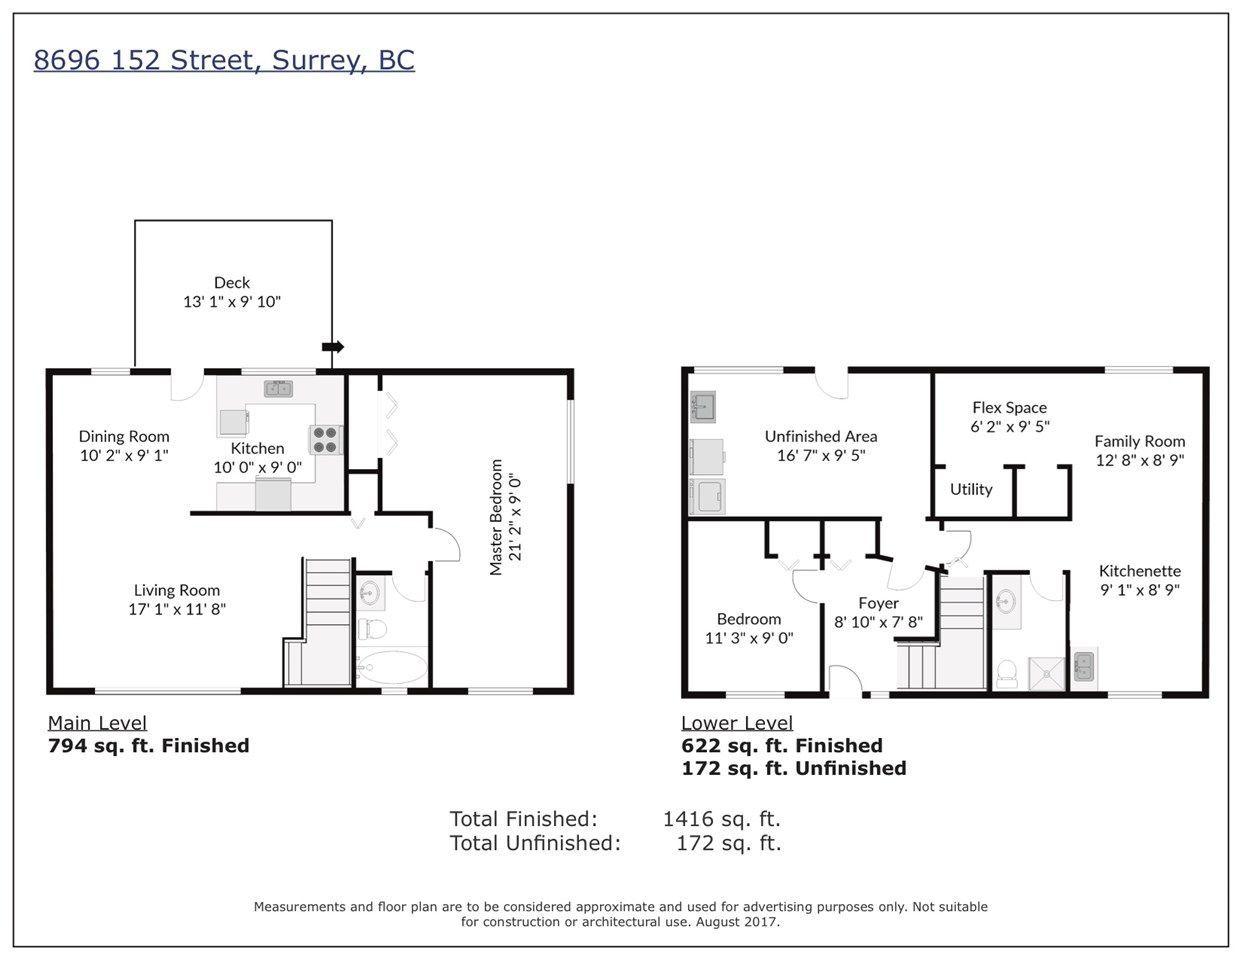 Main Photo: 8696 152 Street in Surrey: Fleetwood Tynehead 1/2 Duplex for sale : MLS®# R2223045